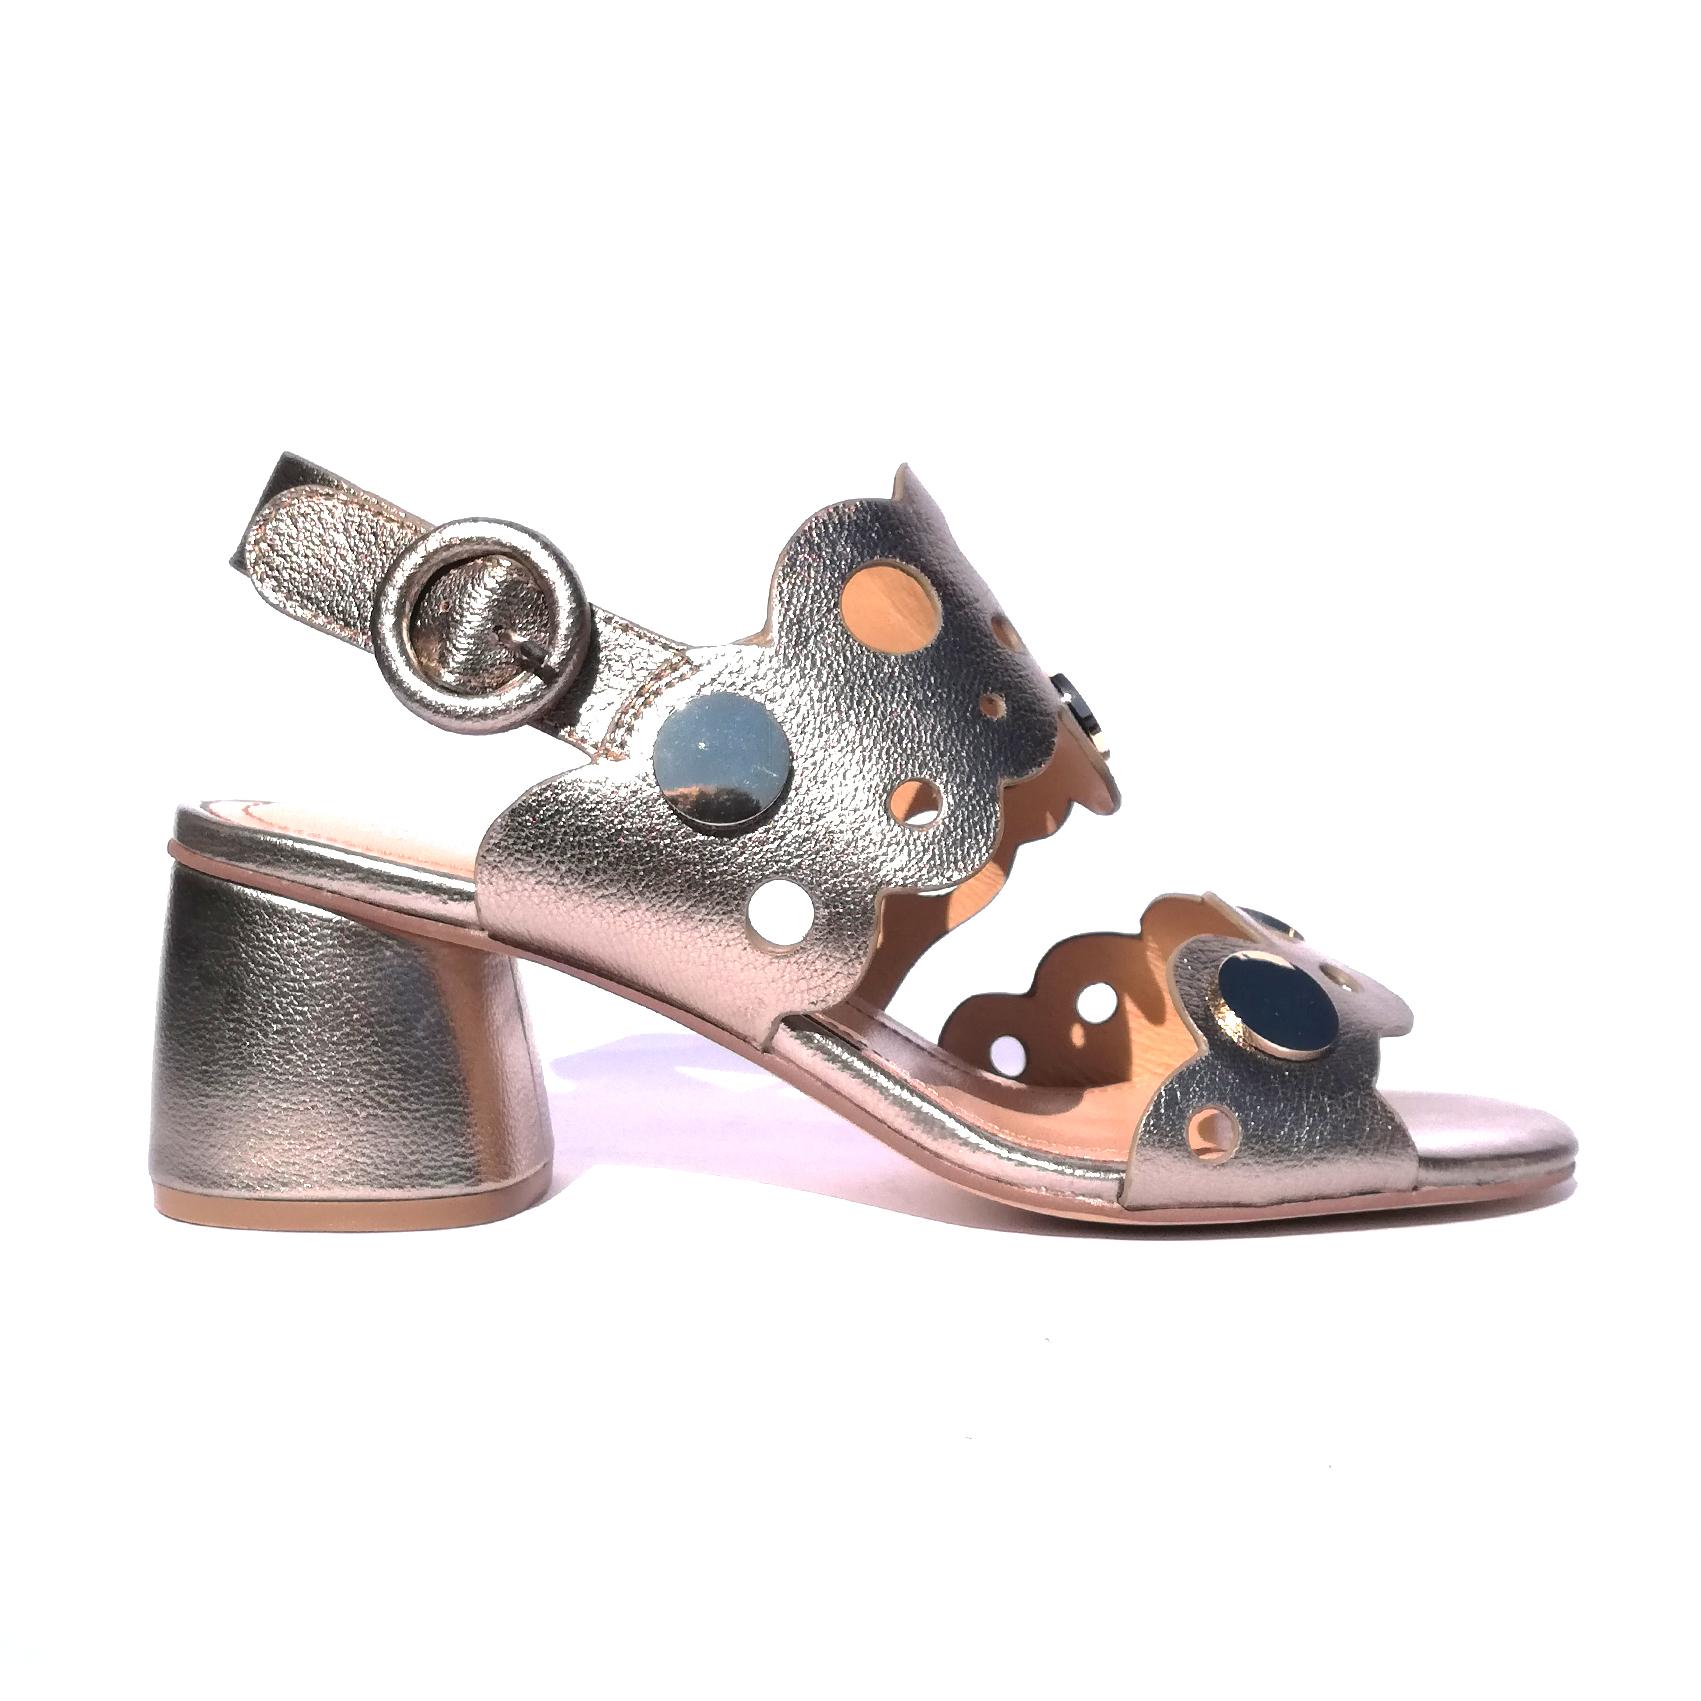 Sandalo platino Adele Dezotti